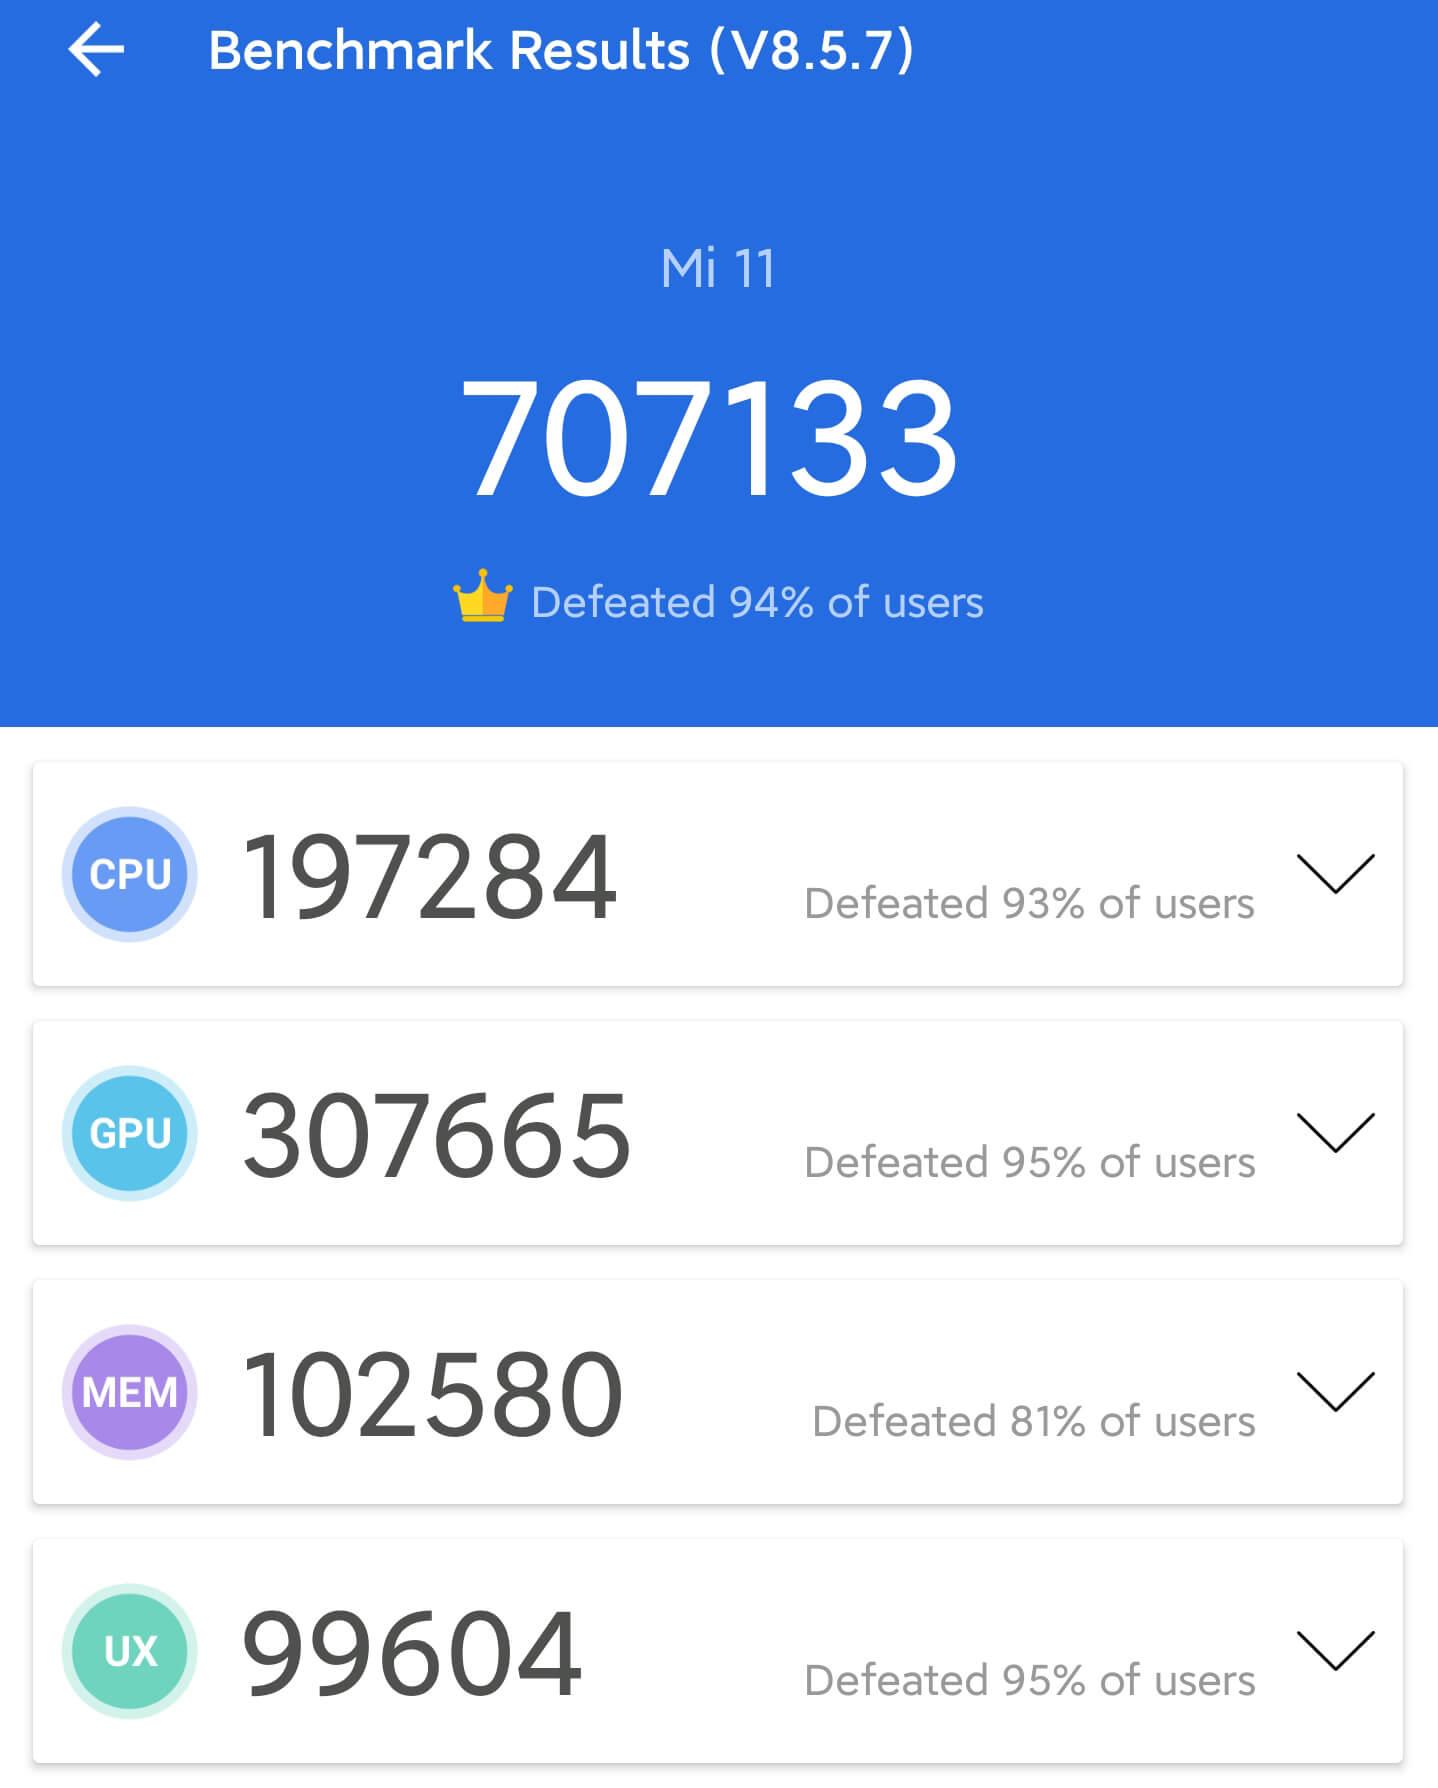 Xiaomi Mi 11のAntutuベンチマークスコア計測1回目は707133